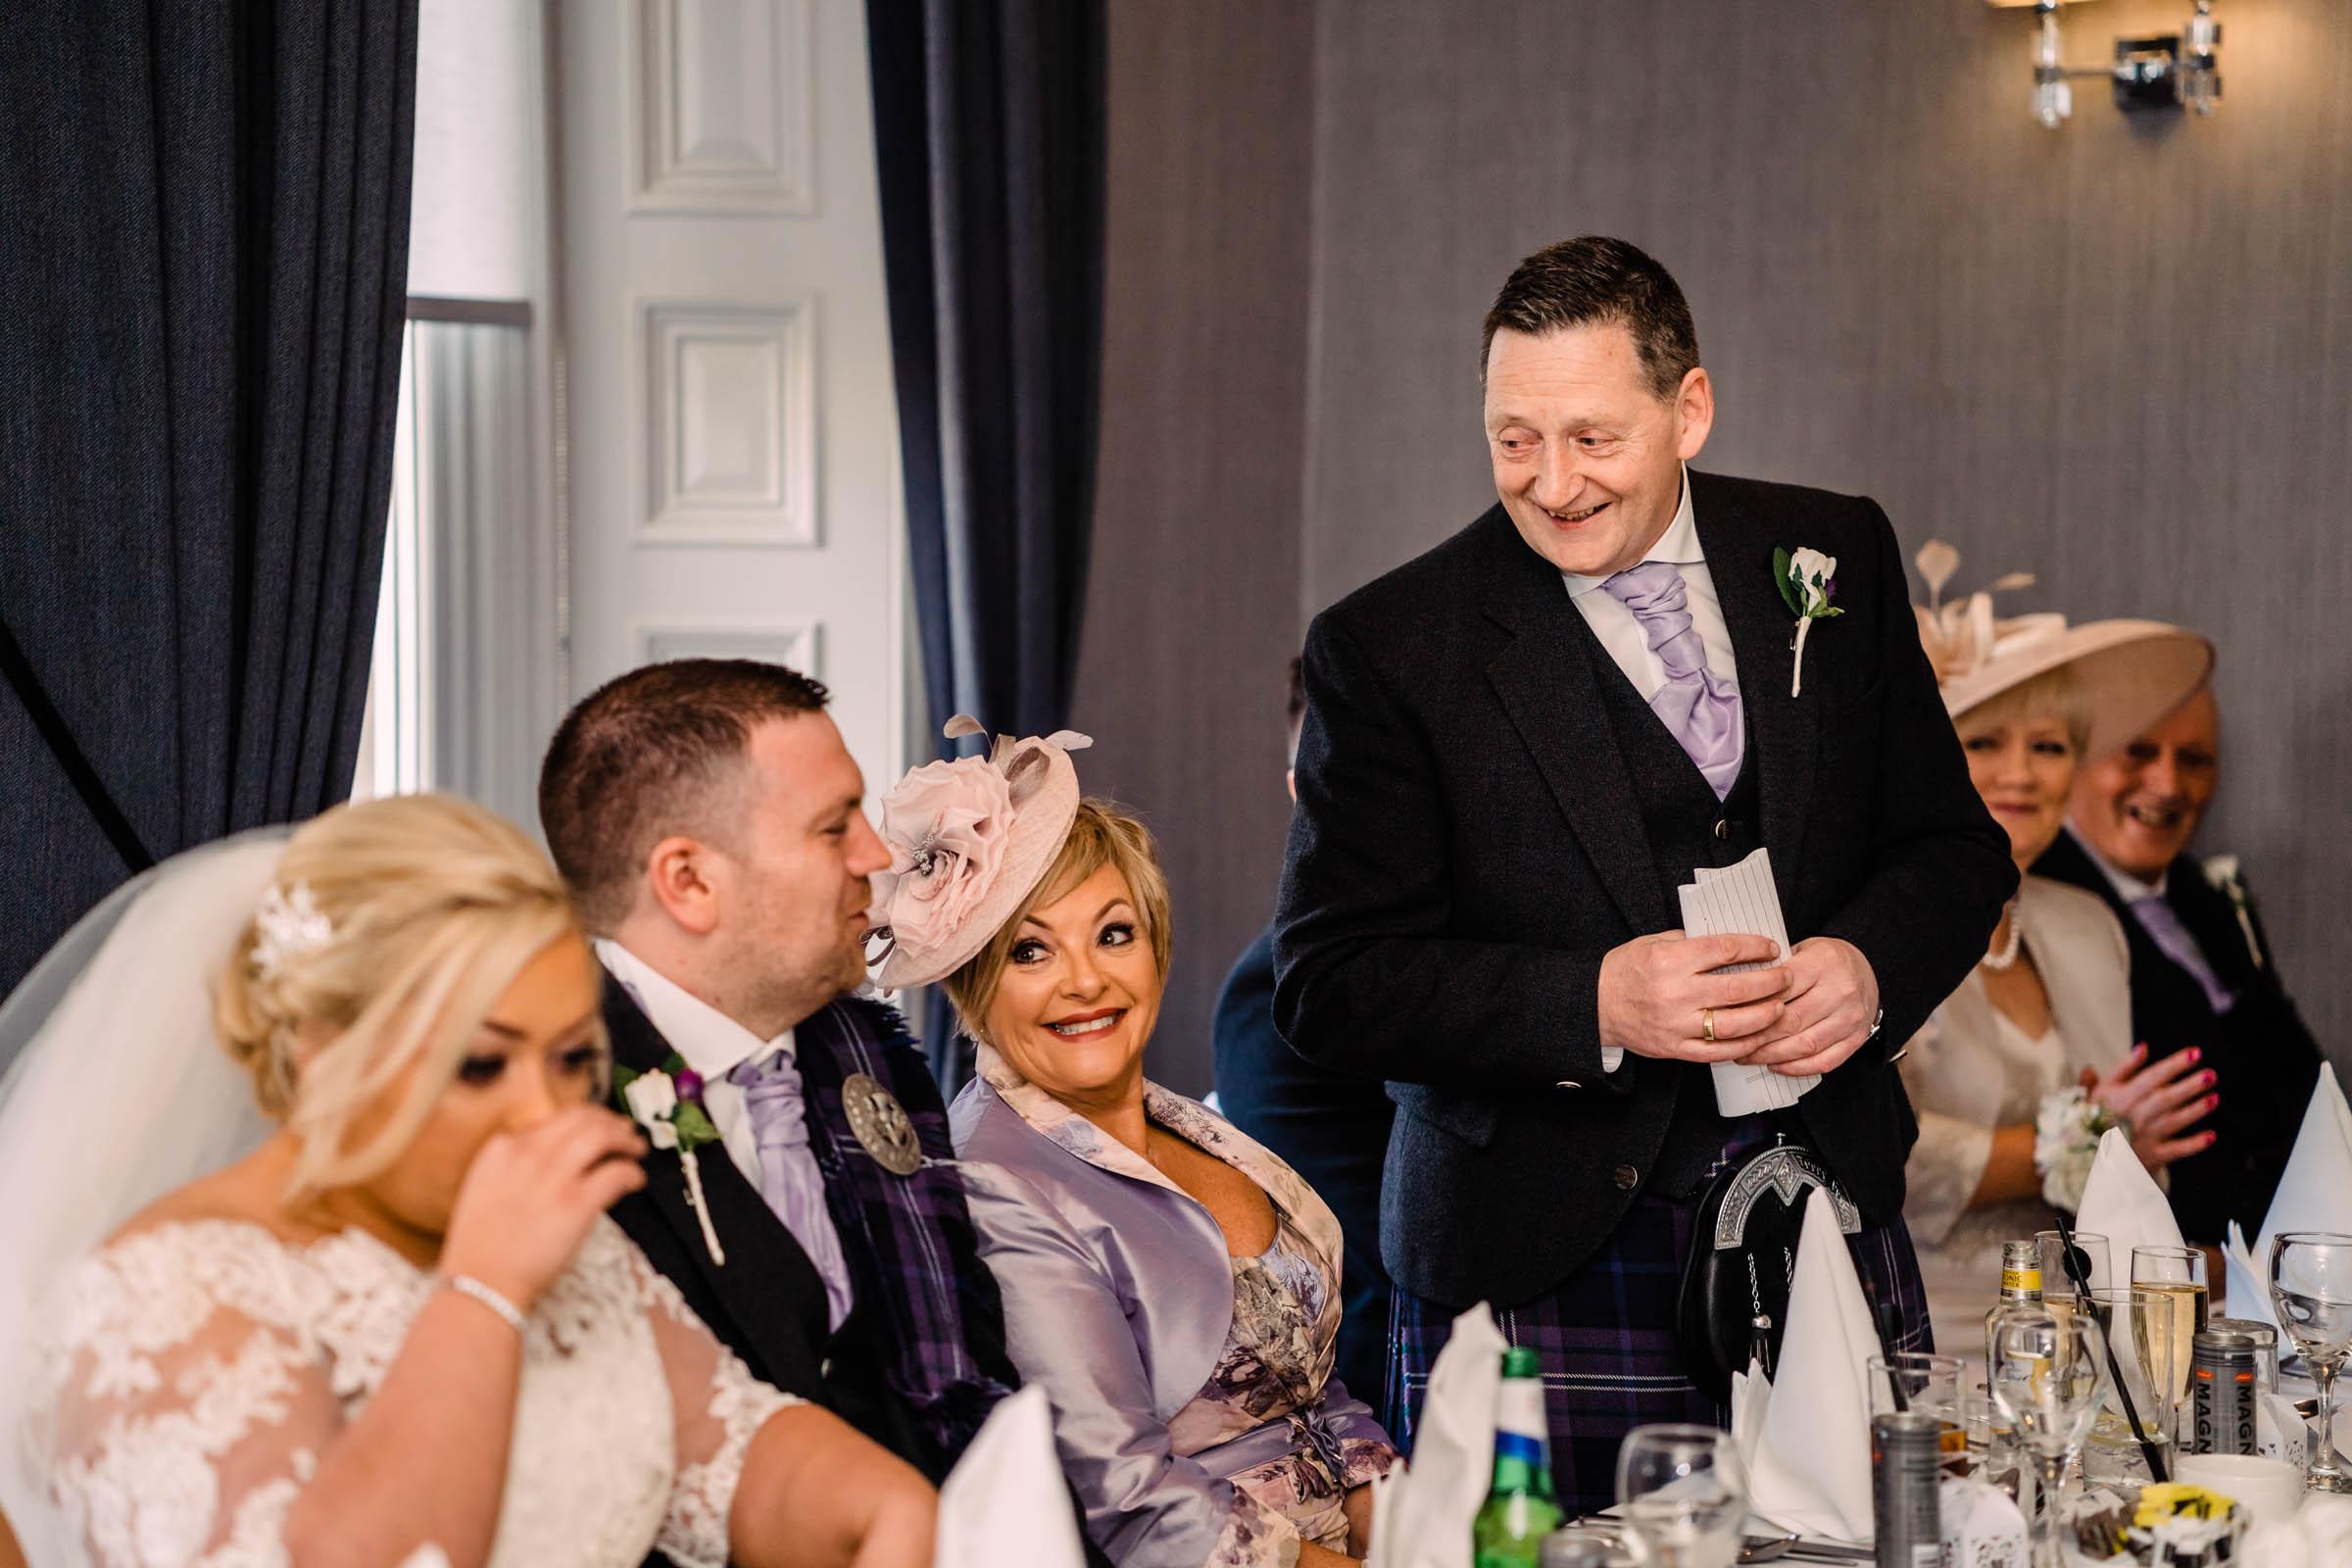 motherwell-moorings-wedding-photographer-dearlyphotography (67 of 77).jpg